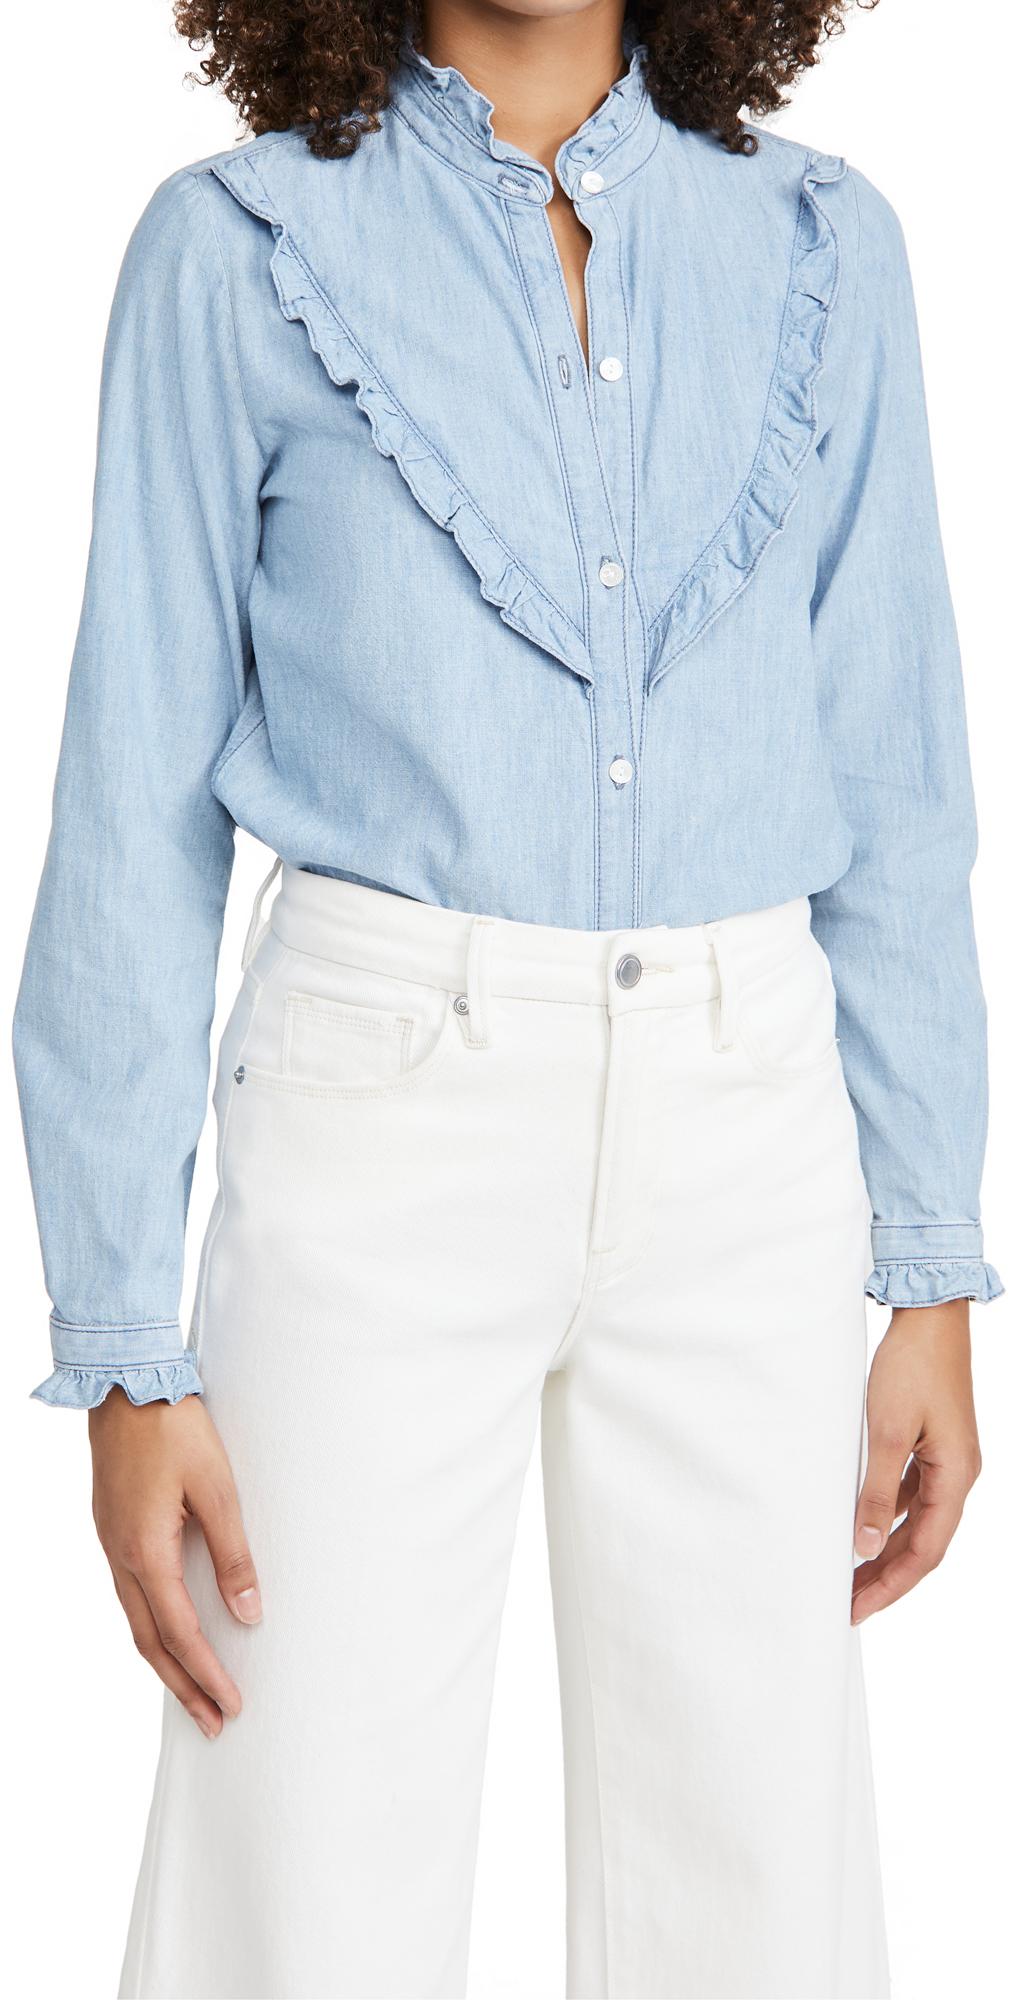 Nili Lotan Marcela Shirt